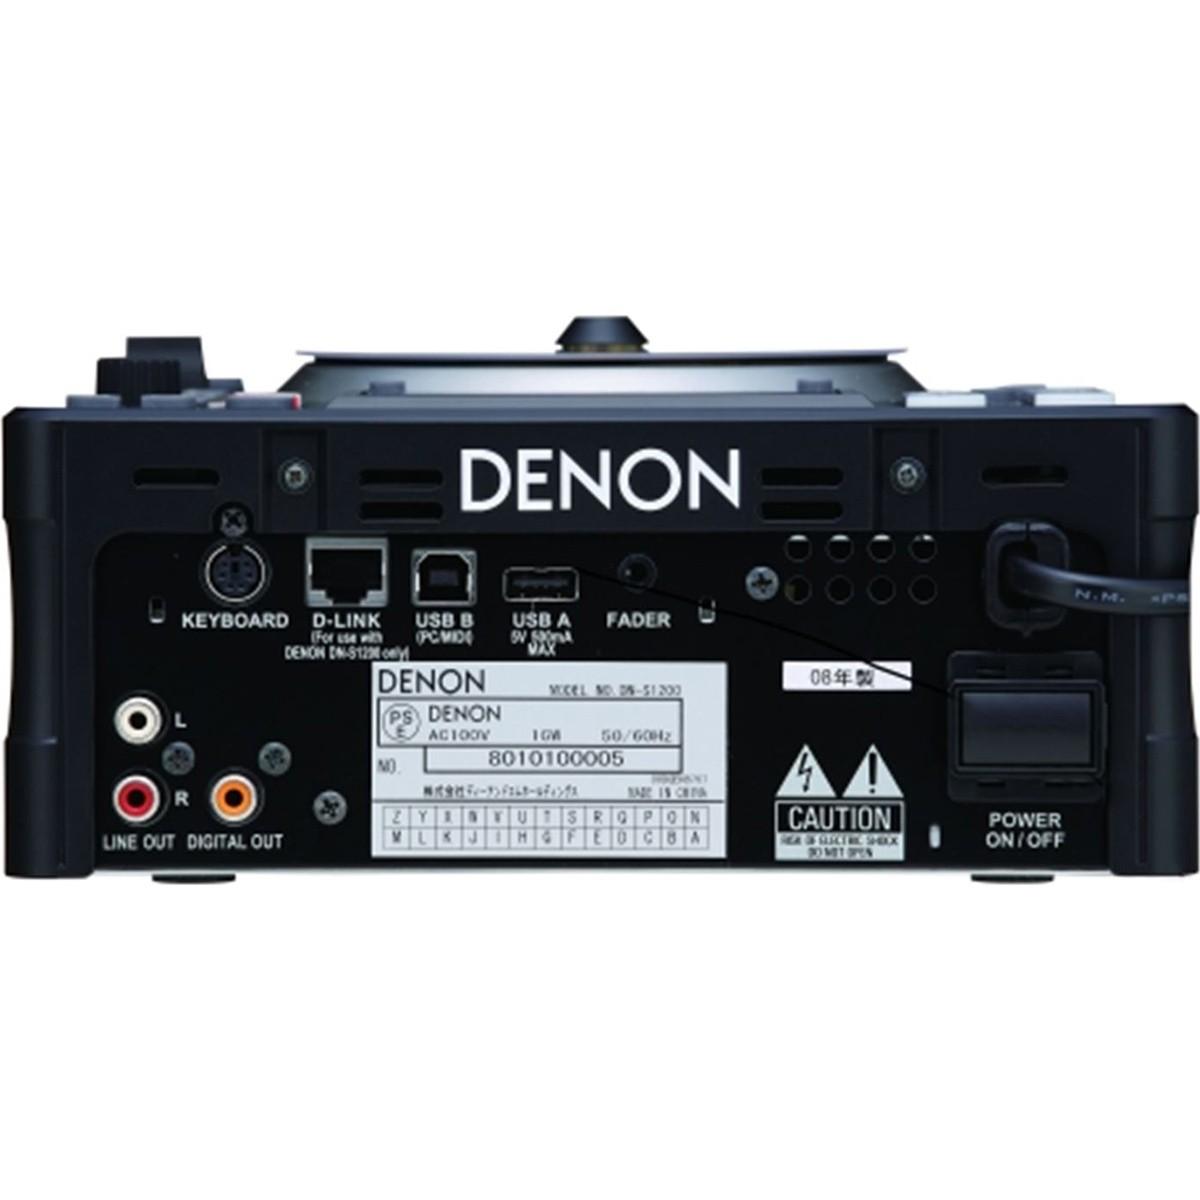 Denon DN-S1200 CDJ Player Profissional Dj, 110v